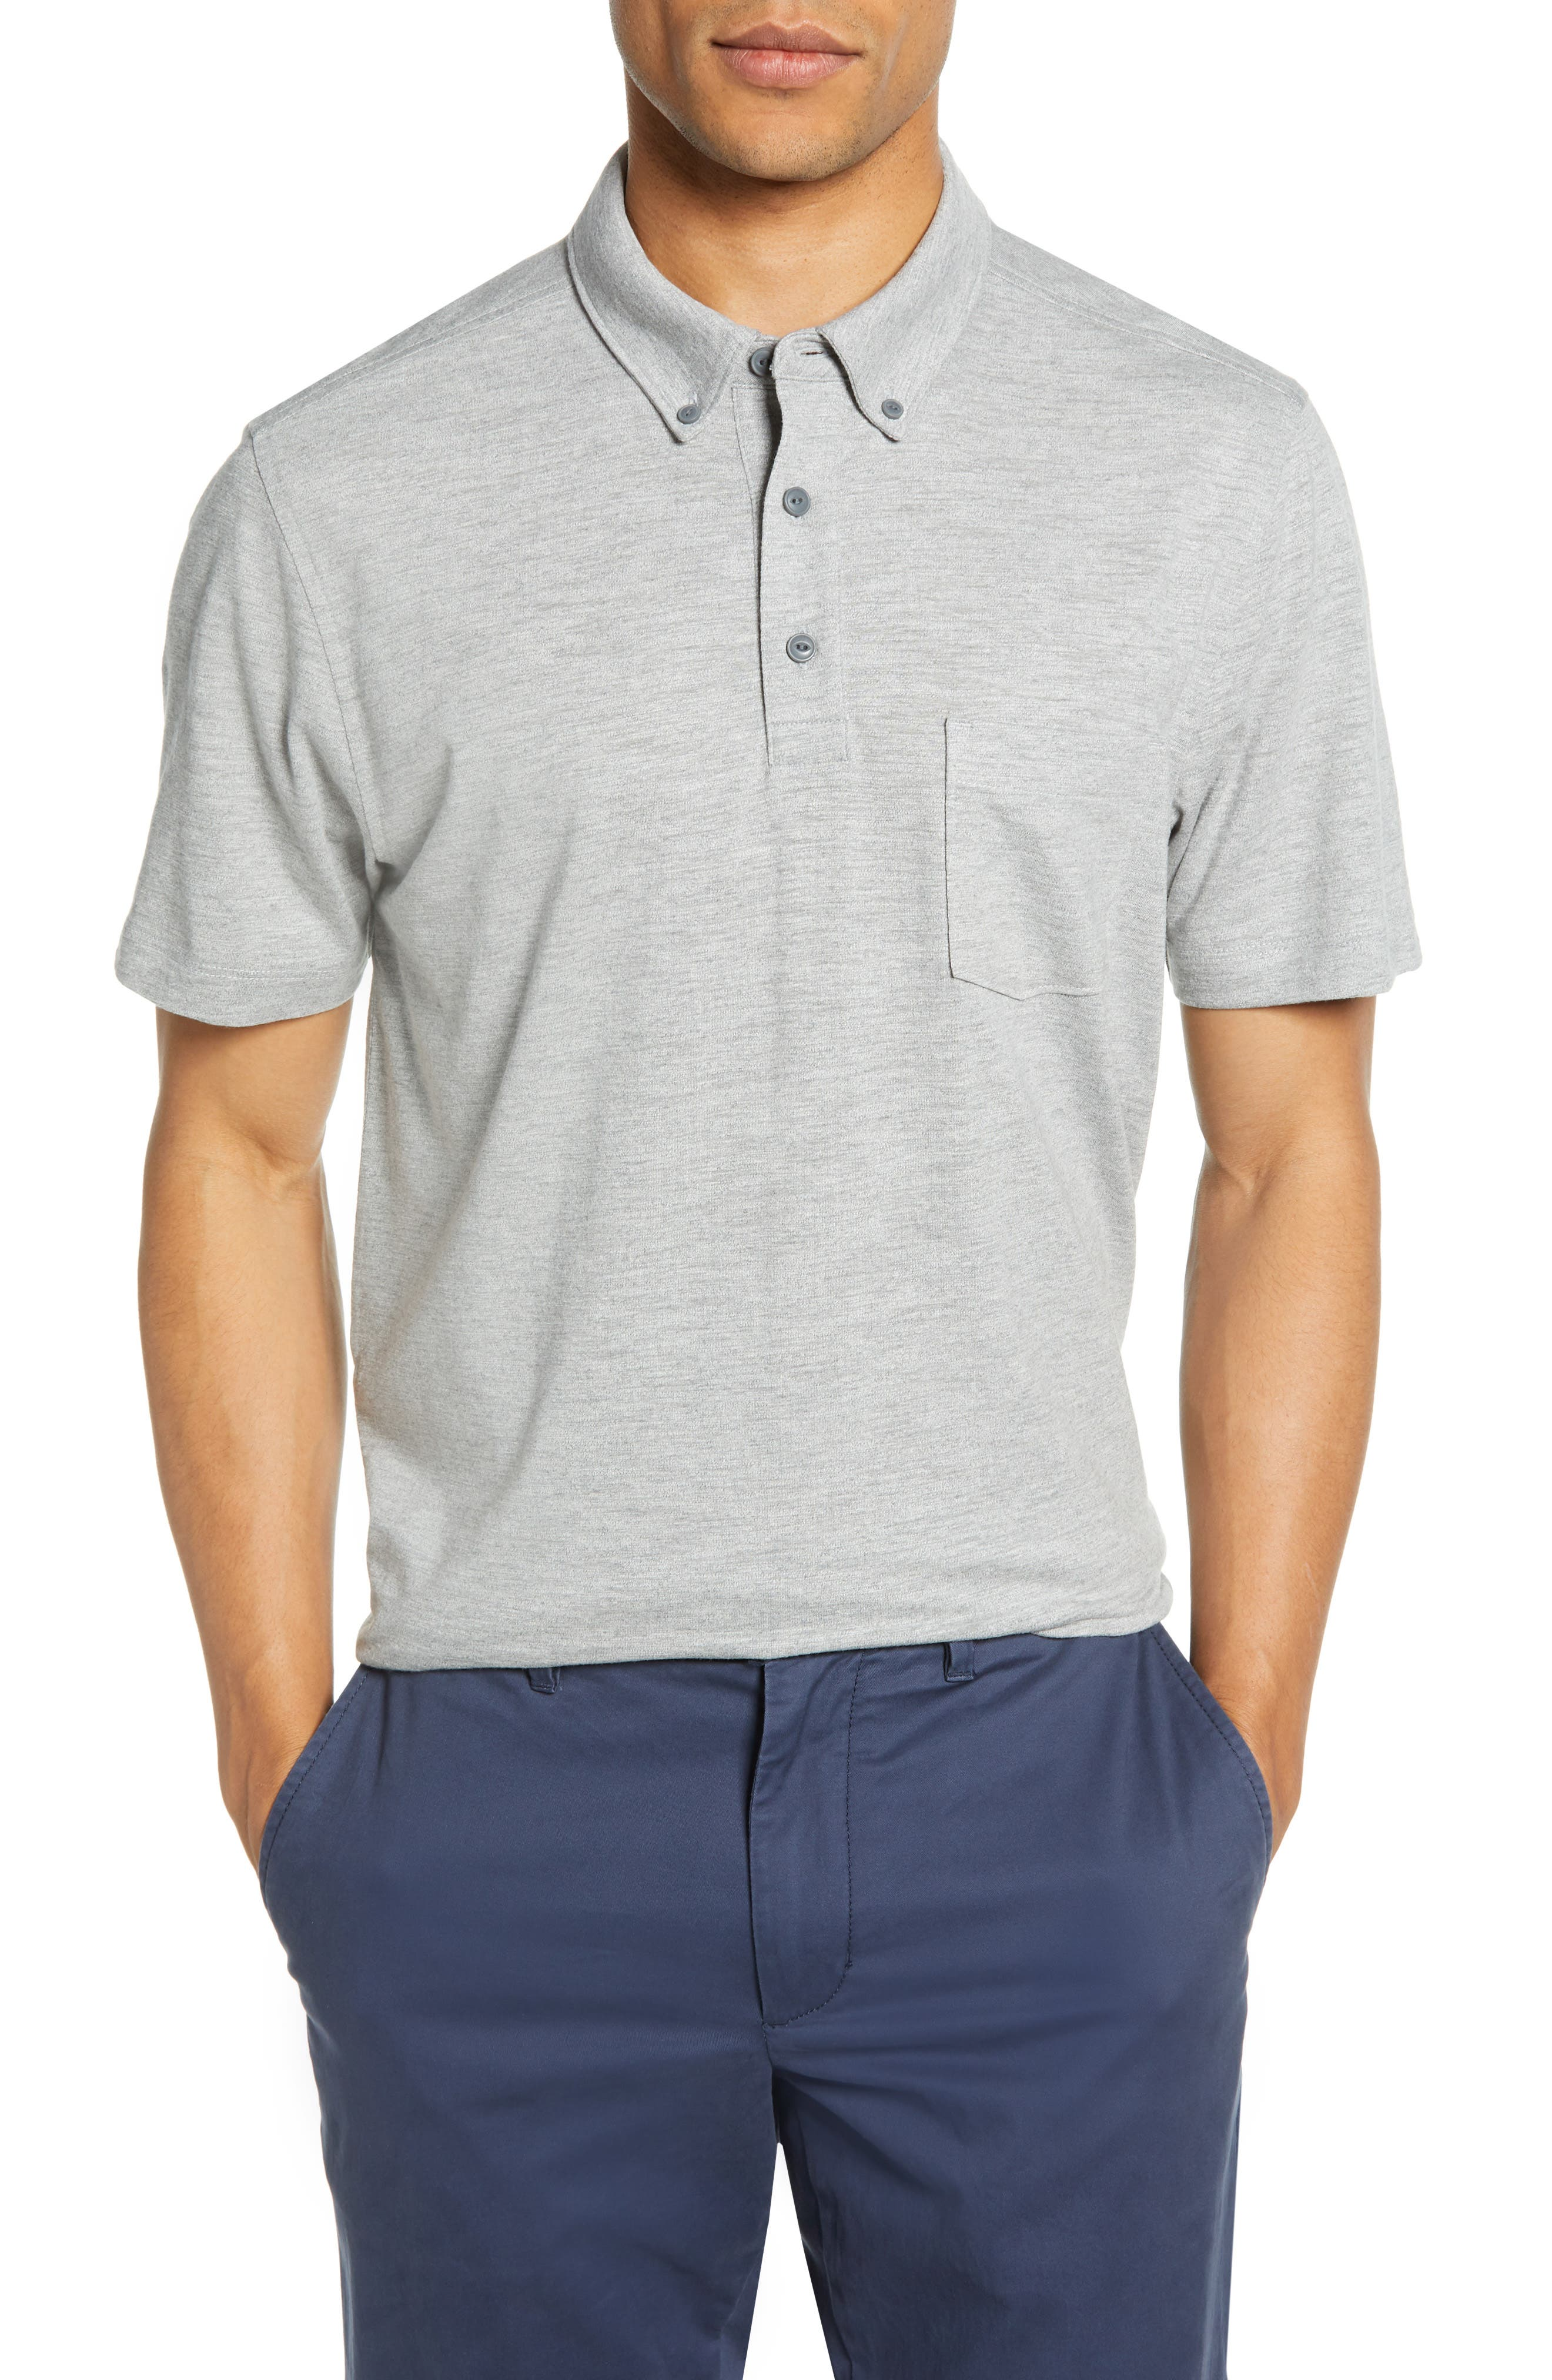 08c32f299 Men s 1901 Polo Shirts